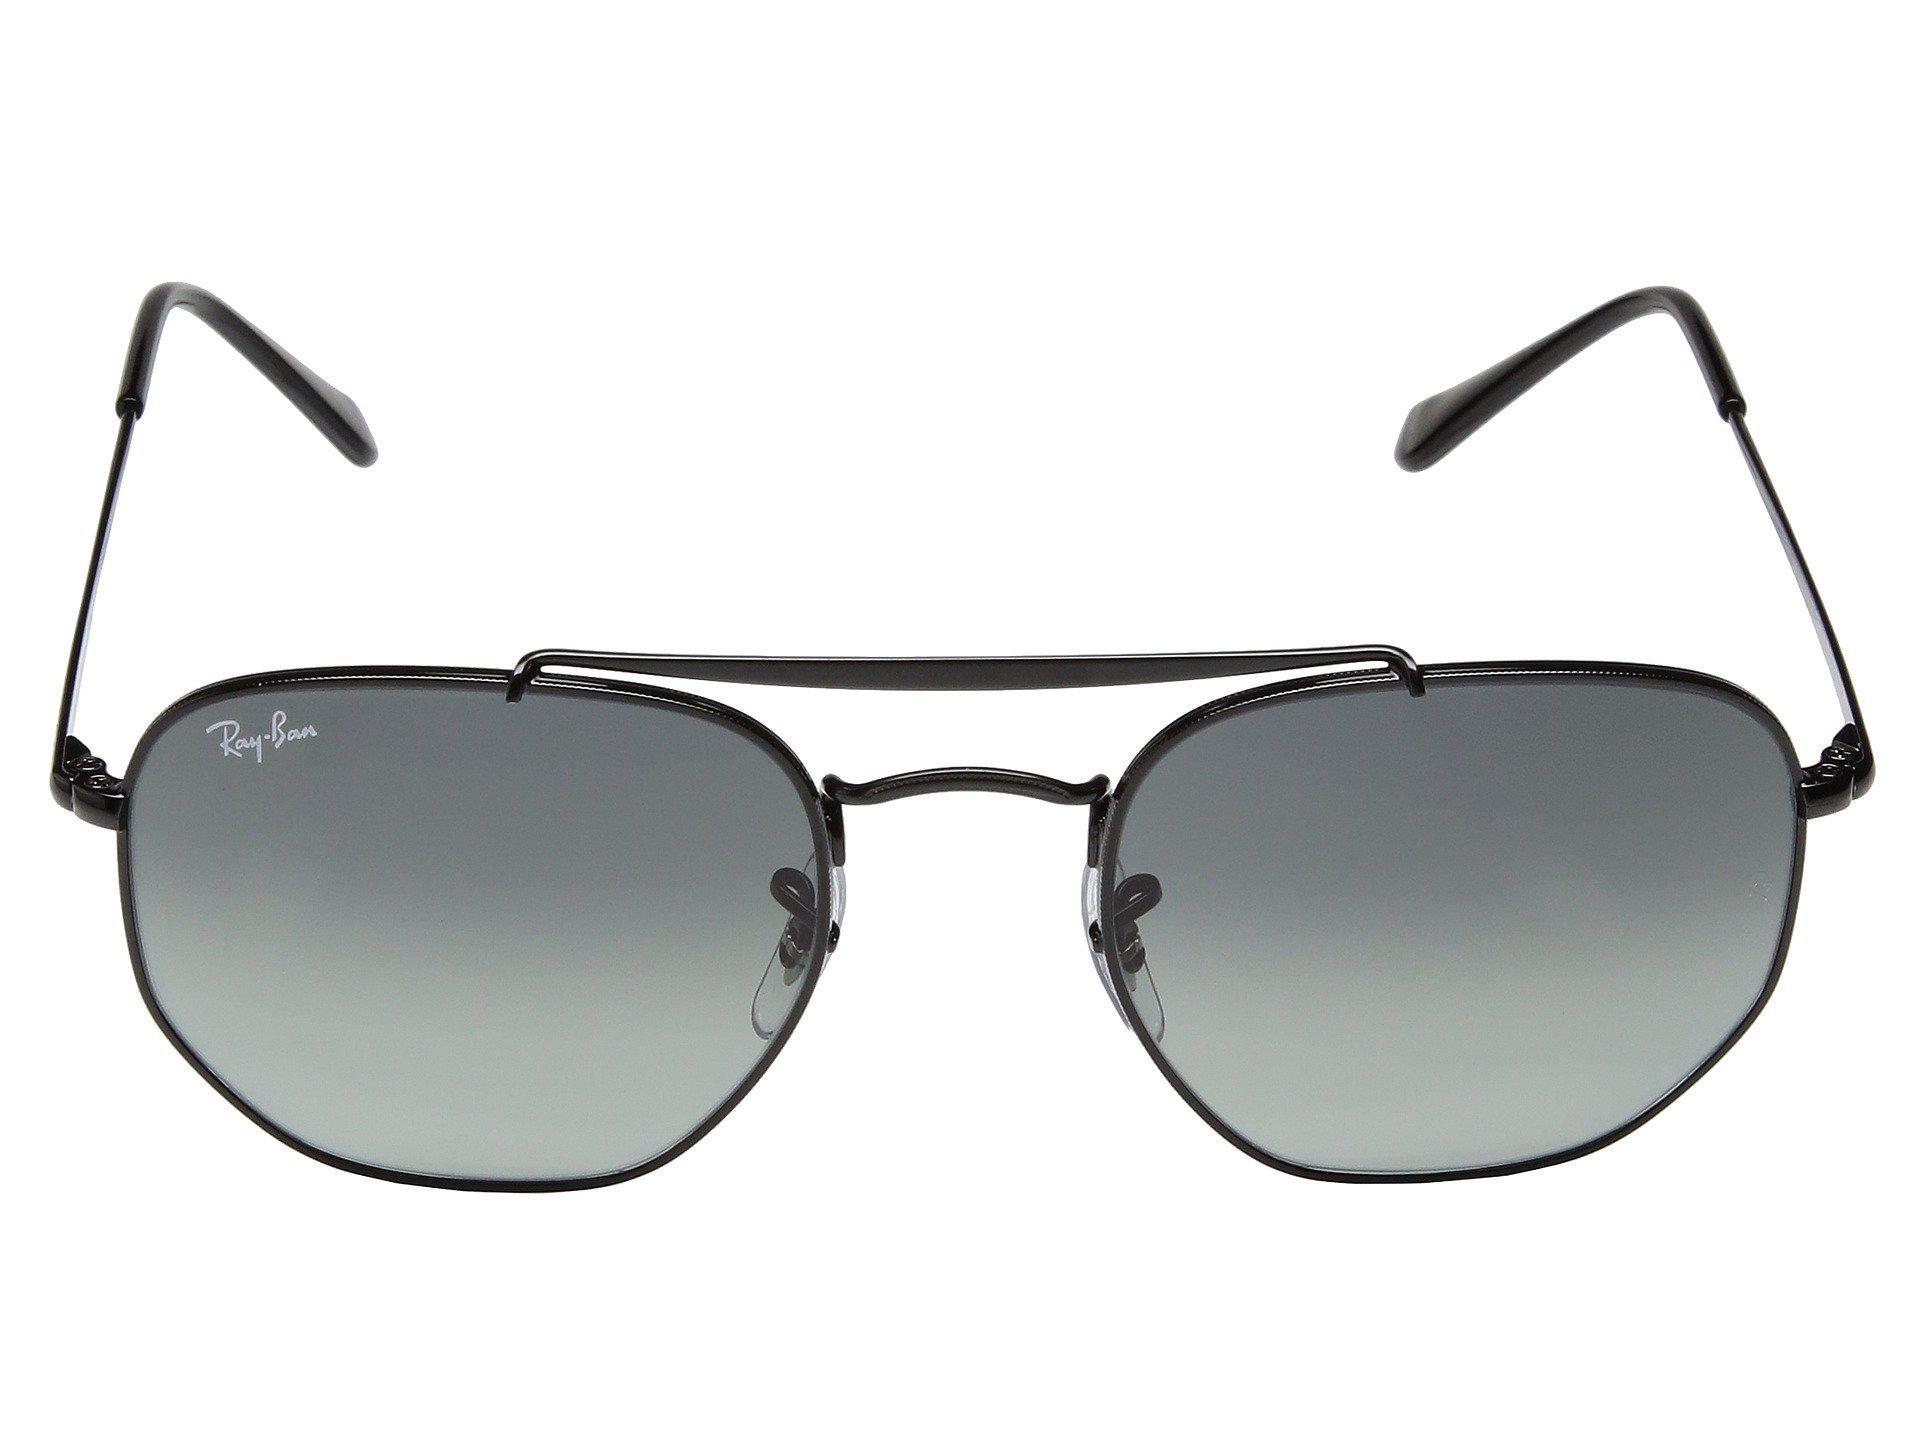 f8cefed448 Ray-Ban - Multicolor Rb3648 Marshall 54mm (black grey Gradient) Fashion  Sunglasses. View fullscreen